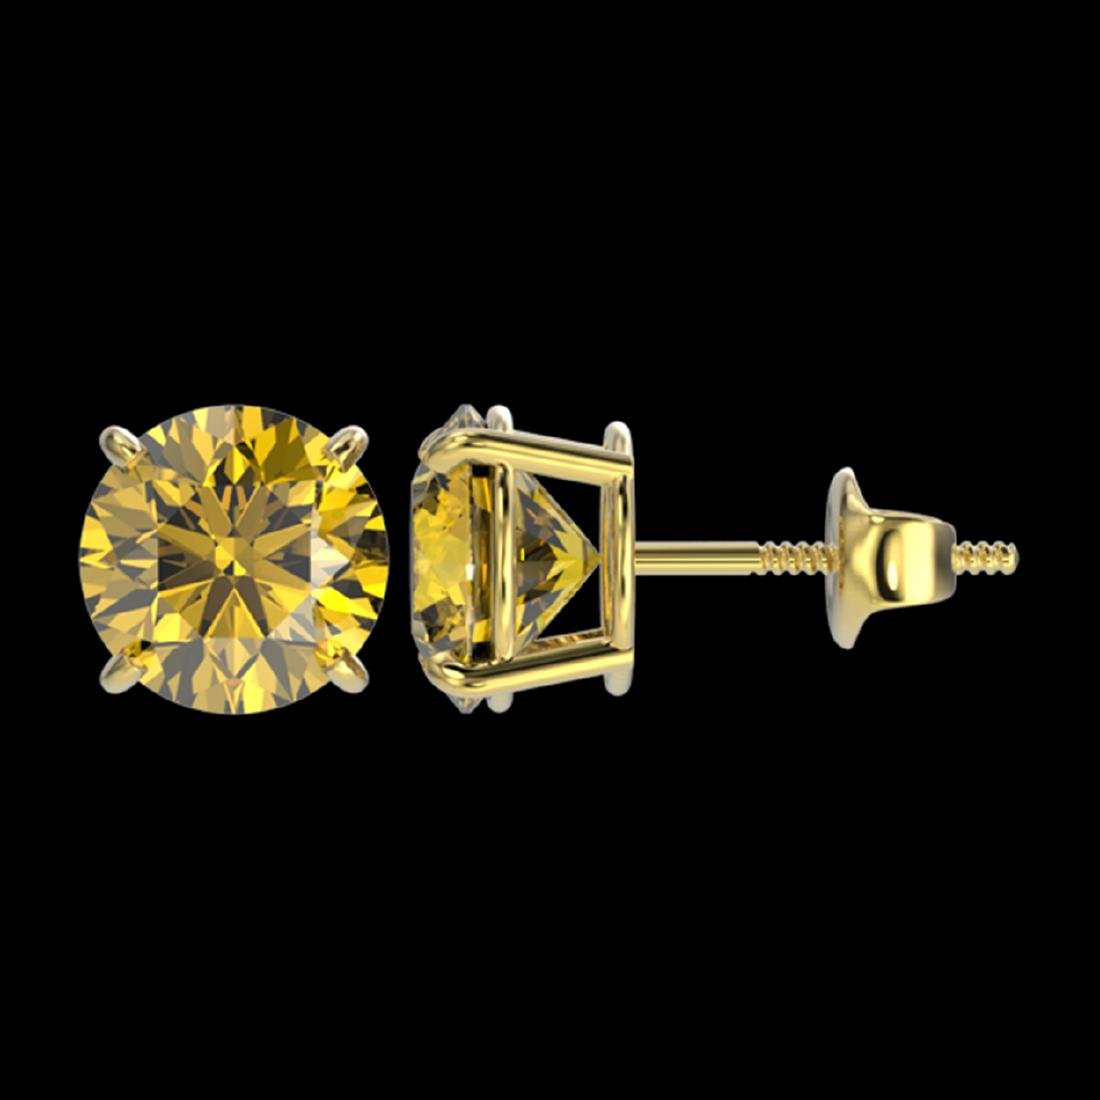 2.57 ctw Intense Yellow SI Diamond Stud Earrings 10K - 2